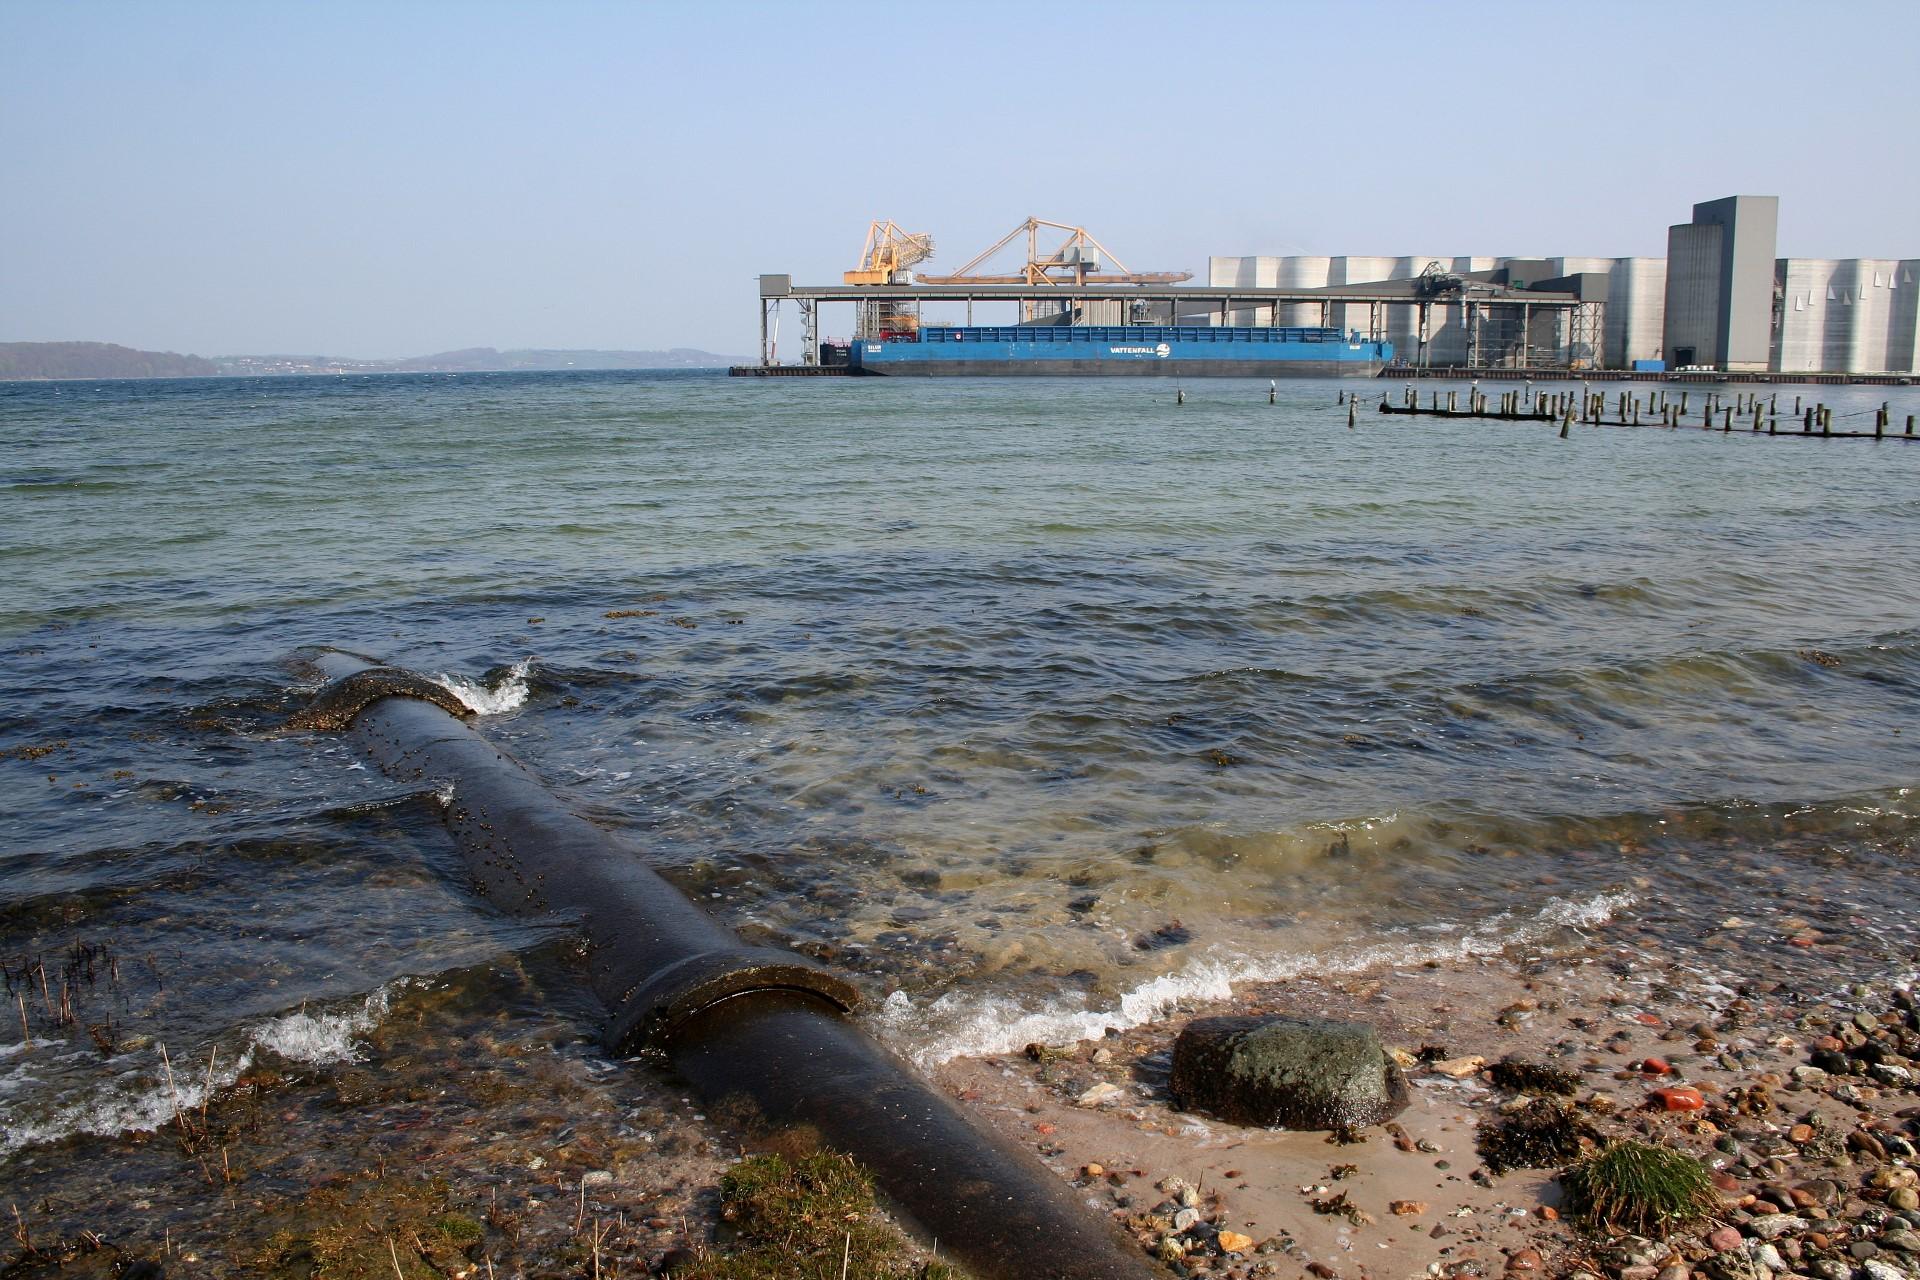 Apenrader Bucht Fishmaps Angelfuhrer Danemark